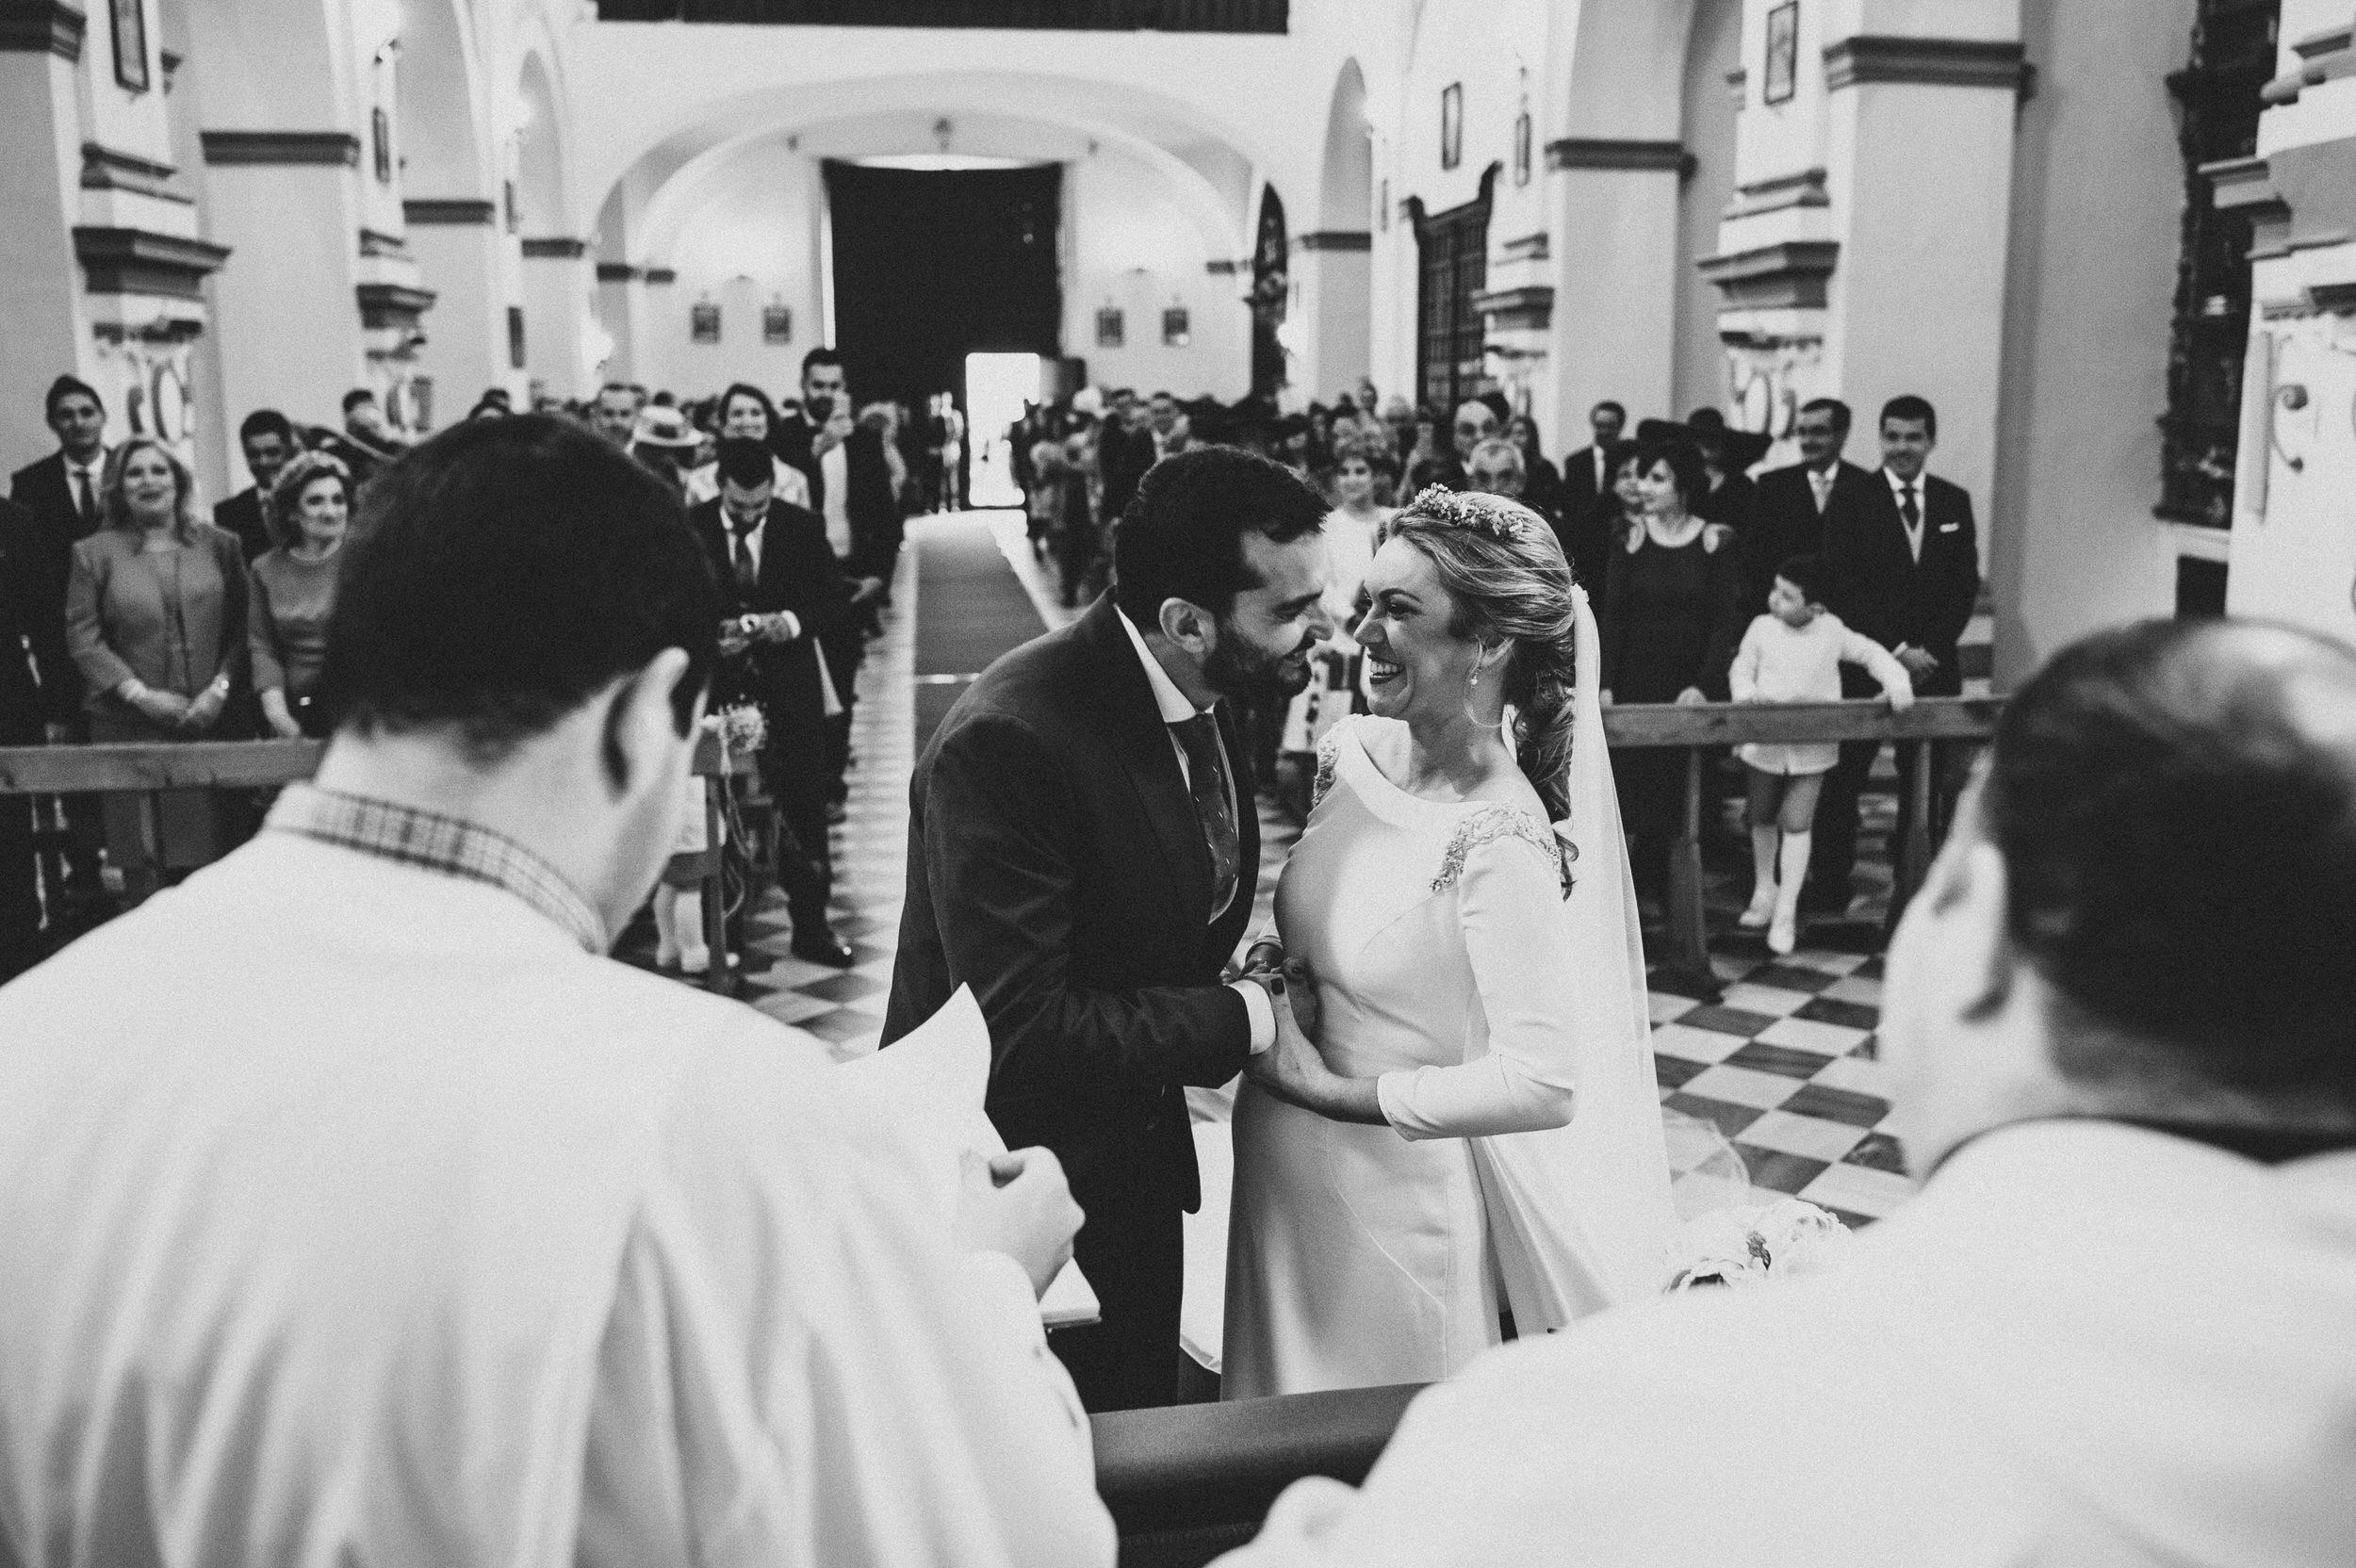 Cristina & Jero - Boda en Ecija - Iglesia Santa Ana - Fotógrafo Andrés Amarillo (27).JPG